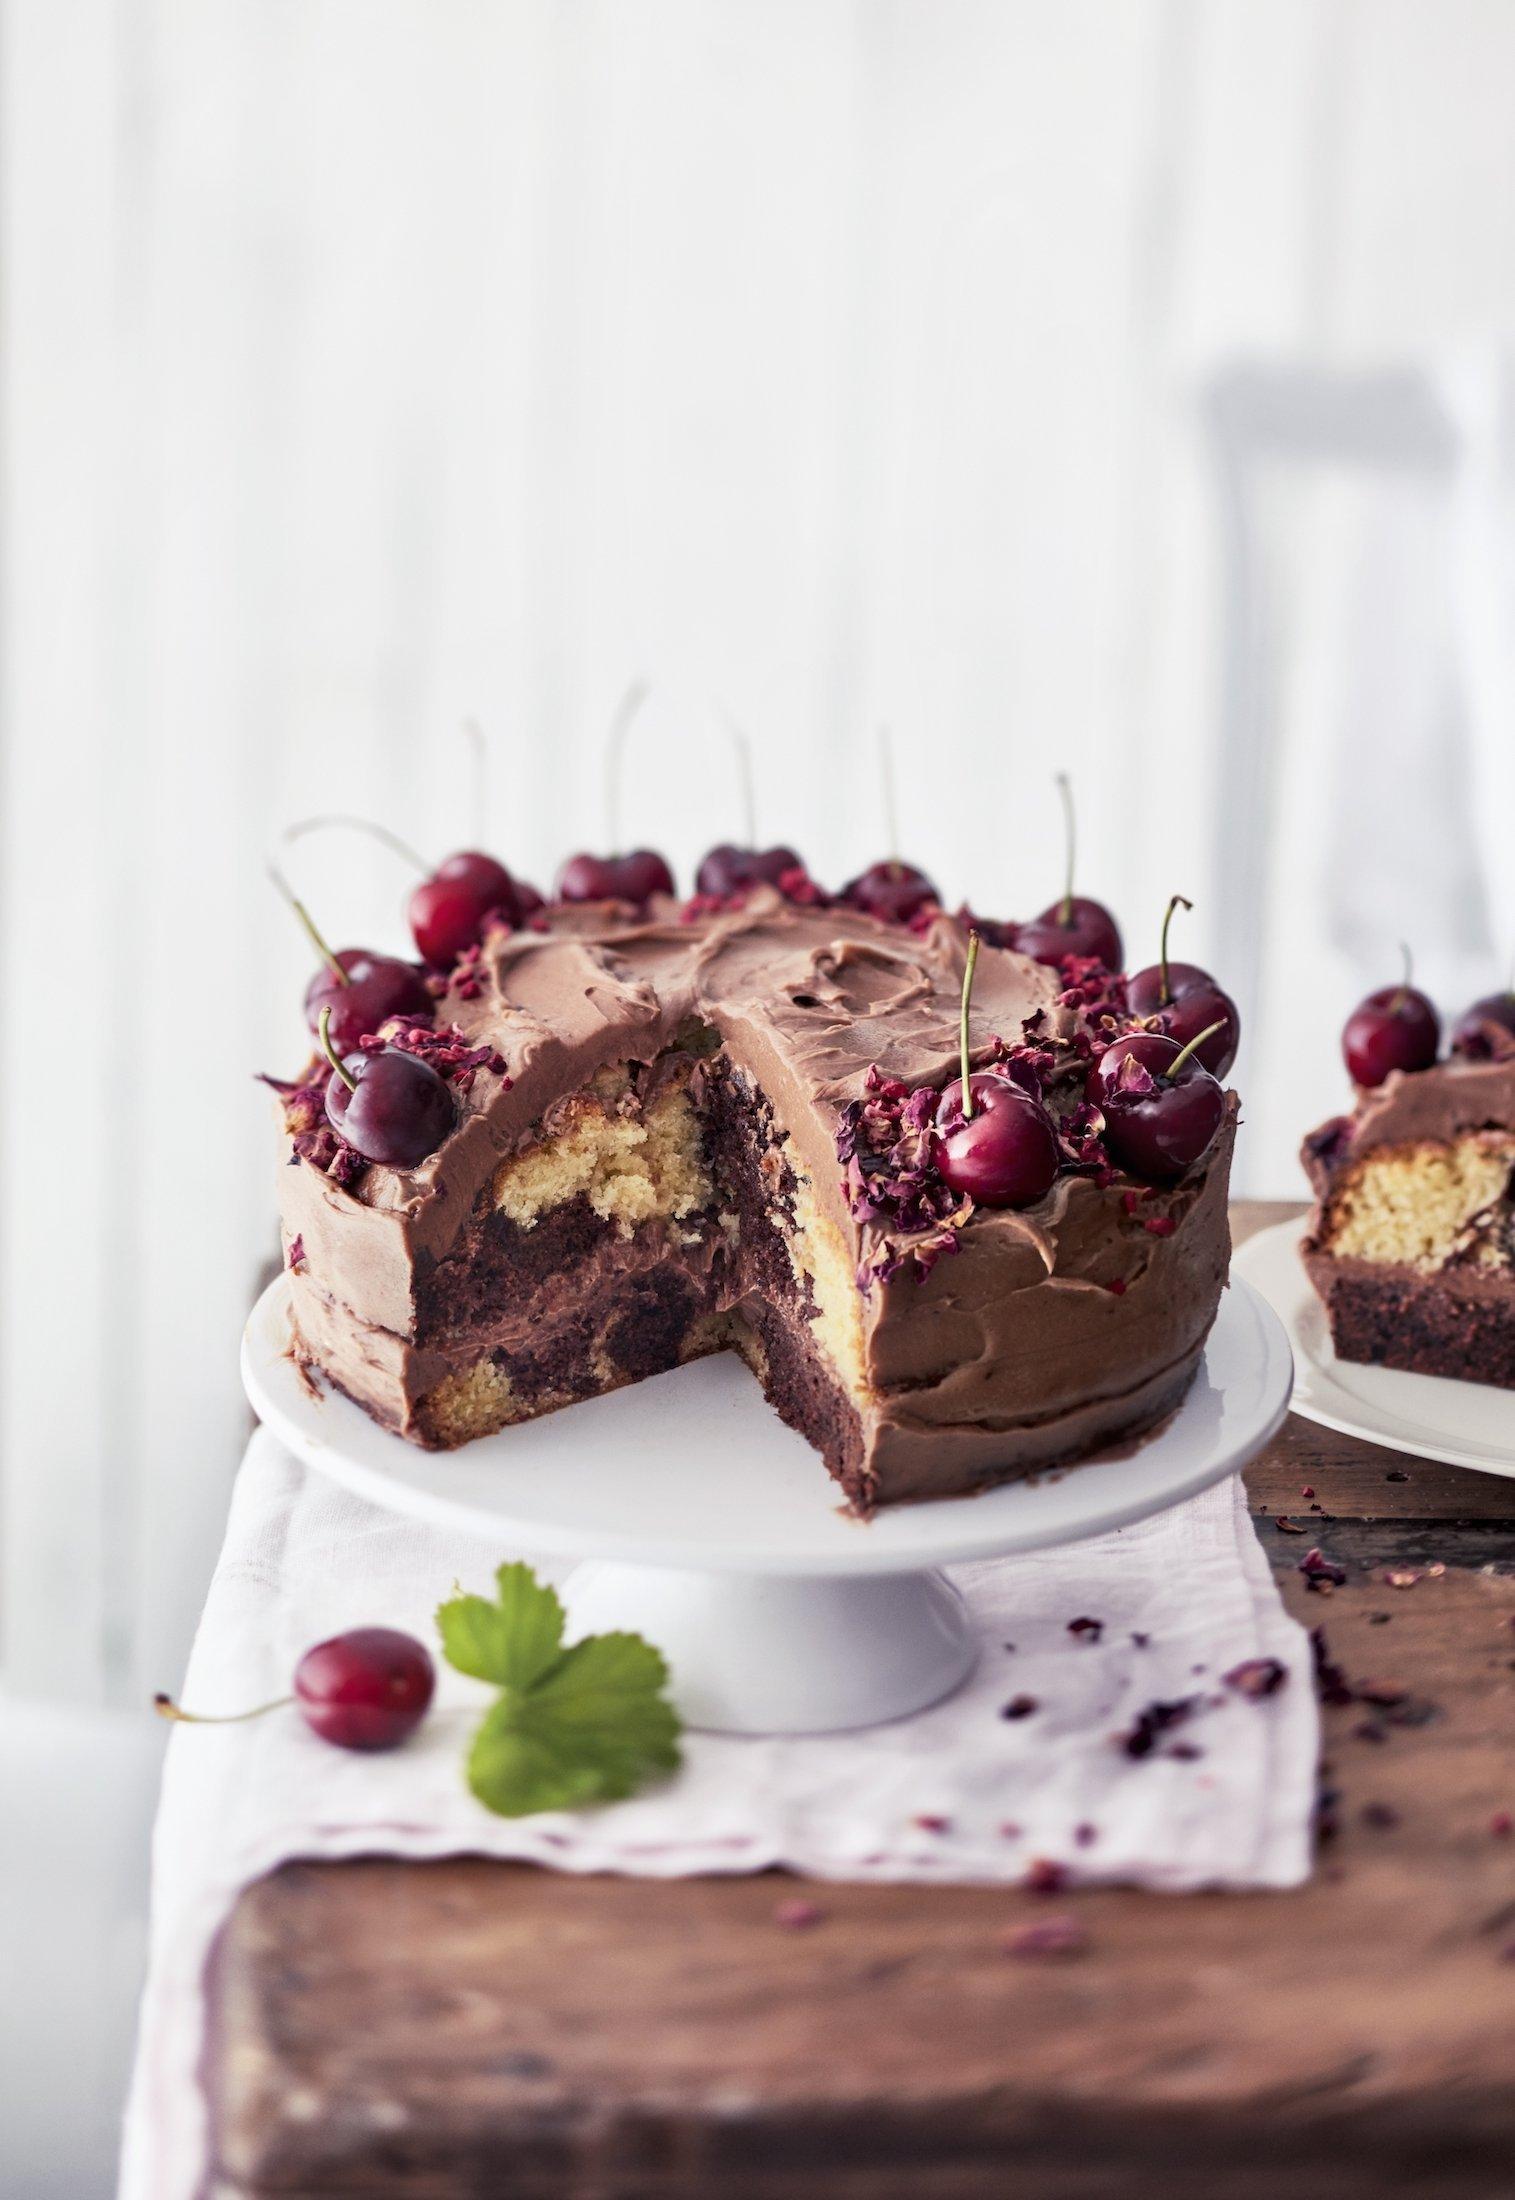 Tygří dort s čokoládou